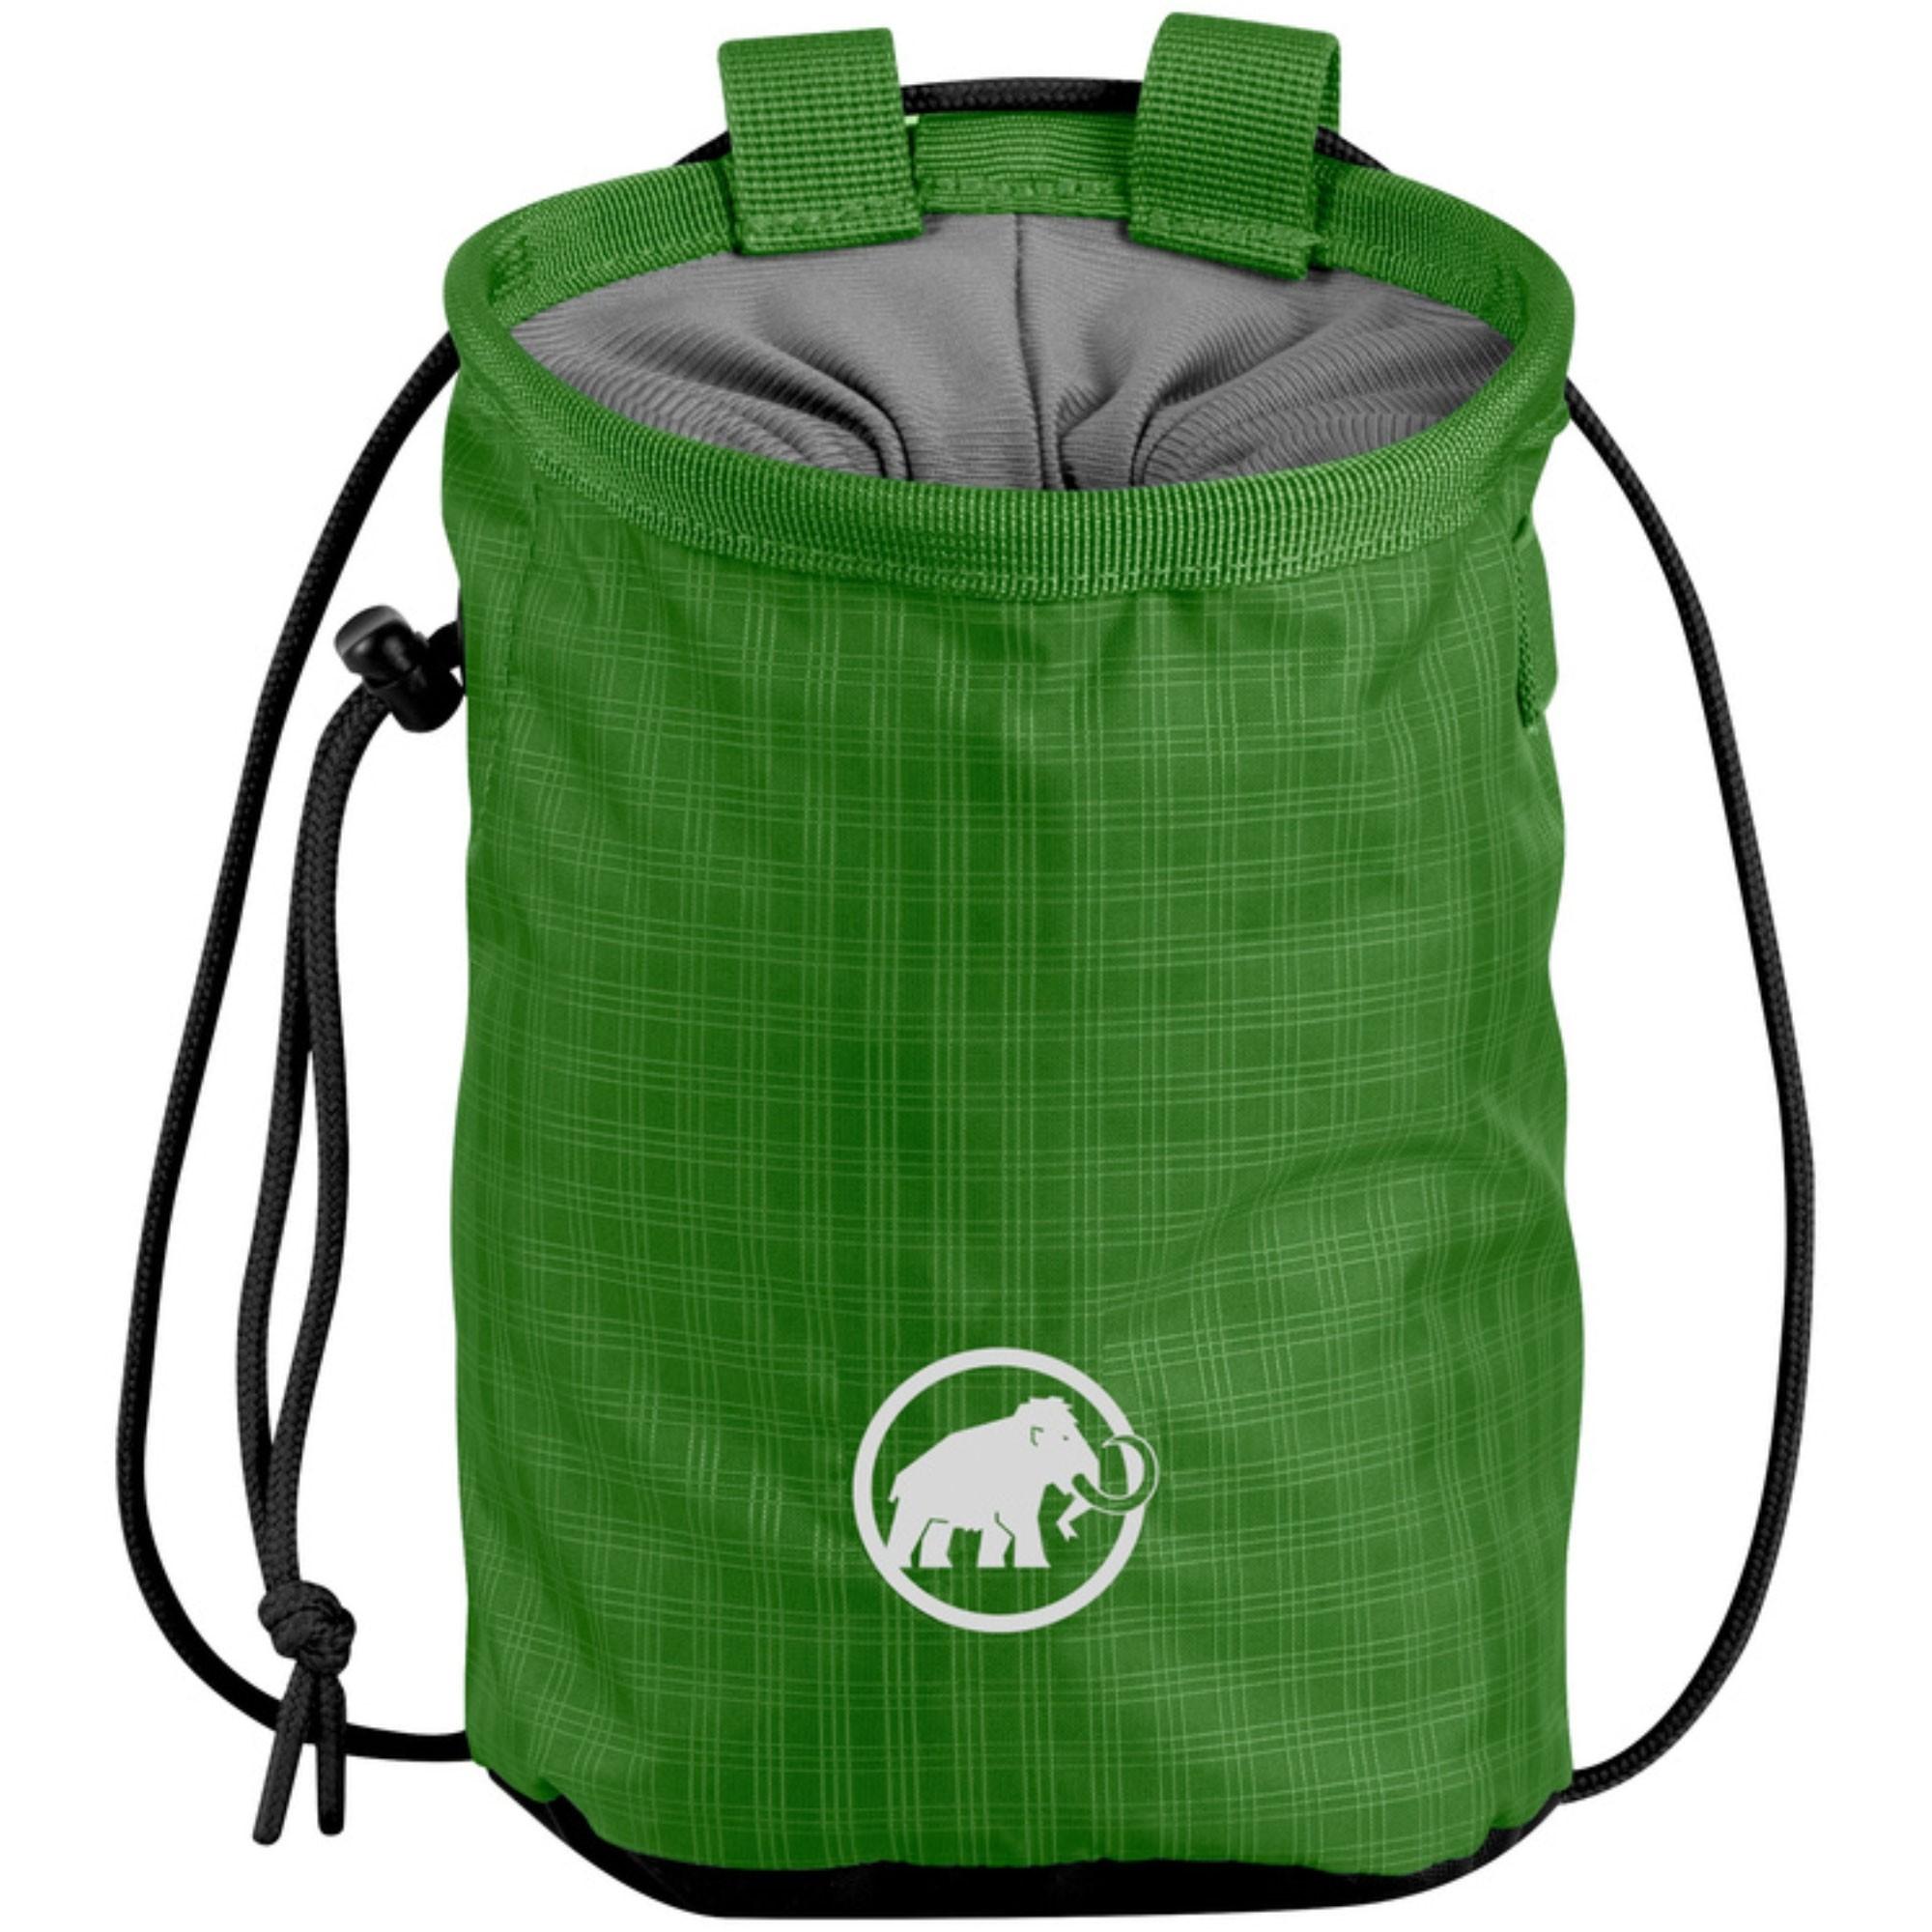 Mammut Basic Chalk Bag - Sherwood